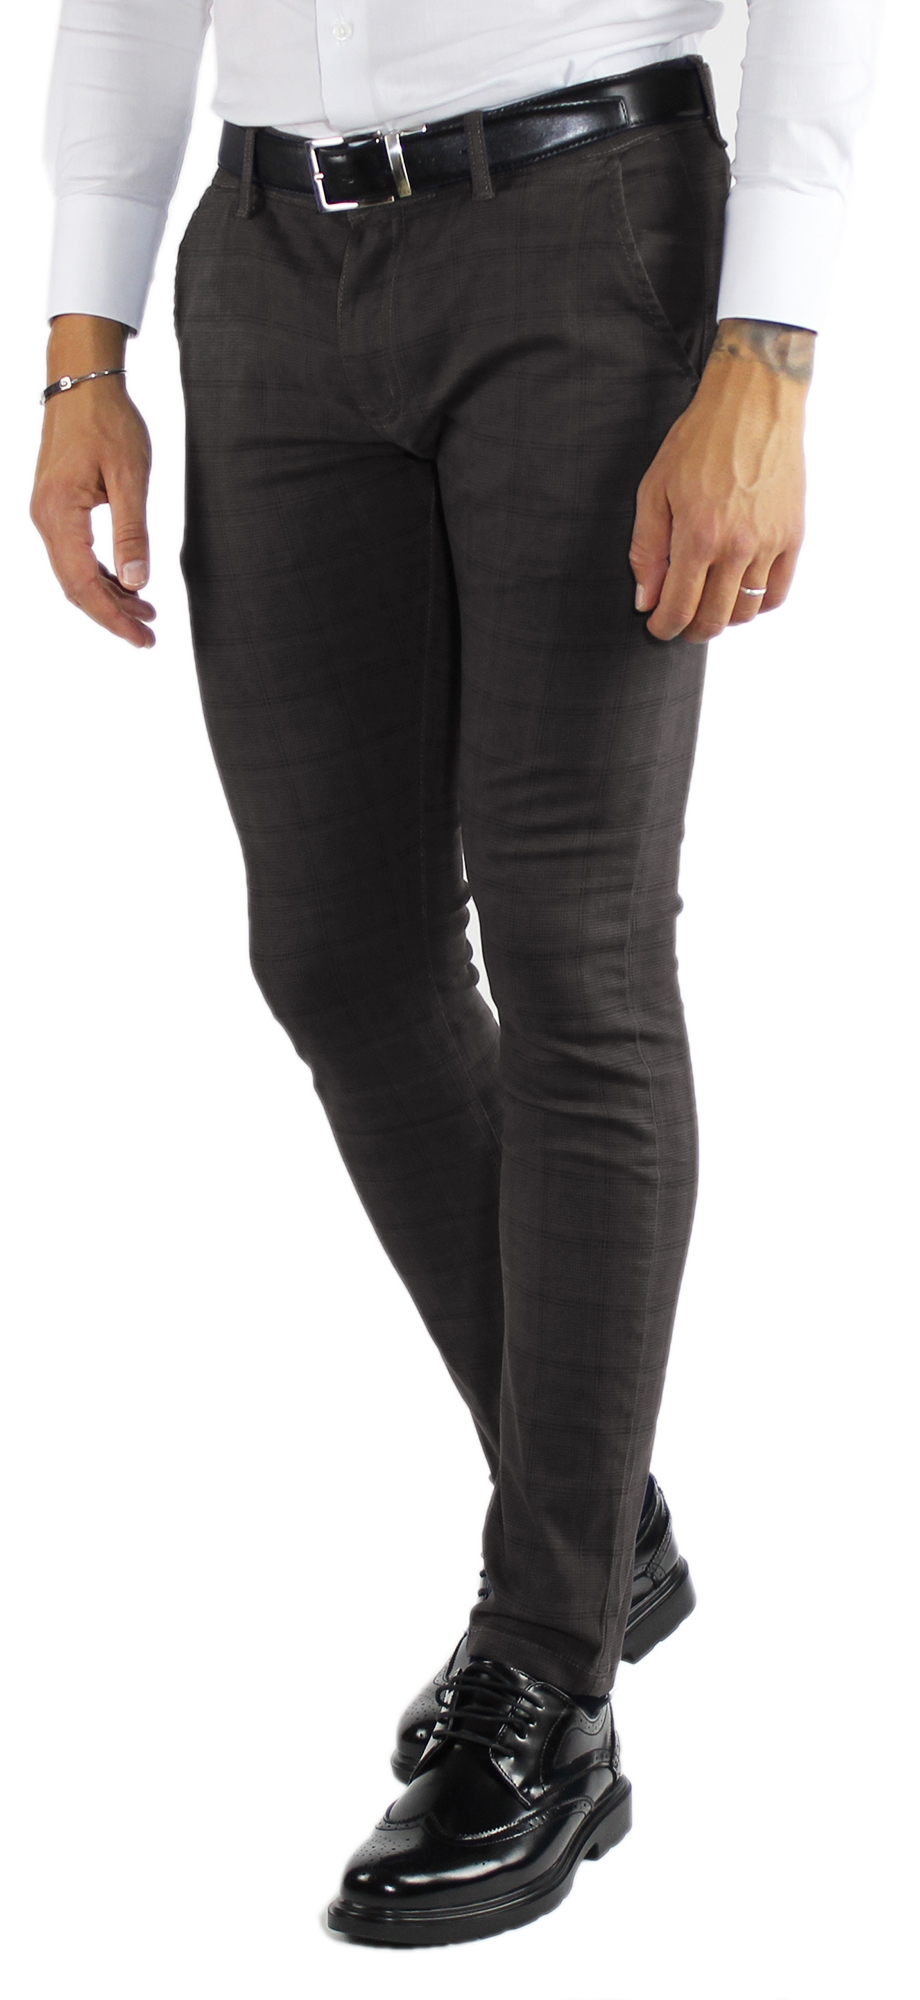 Pantaloni-Uomo-Invernali-a-Quadri-Eleganti-Pantalone-Slim-Fit-Elasticizzati-Scoz miniatura 16